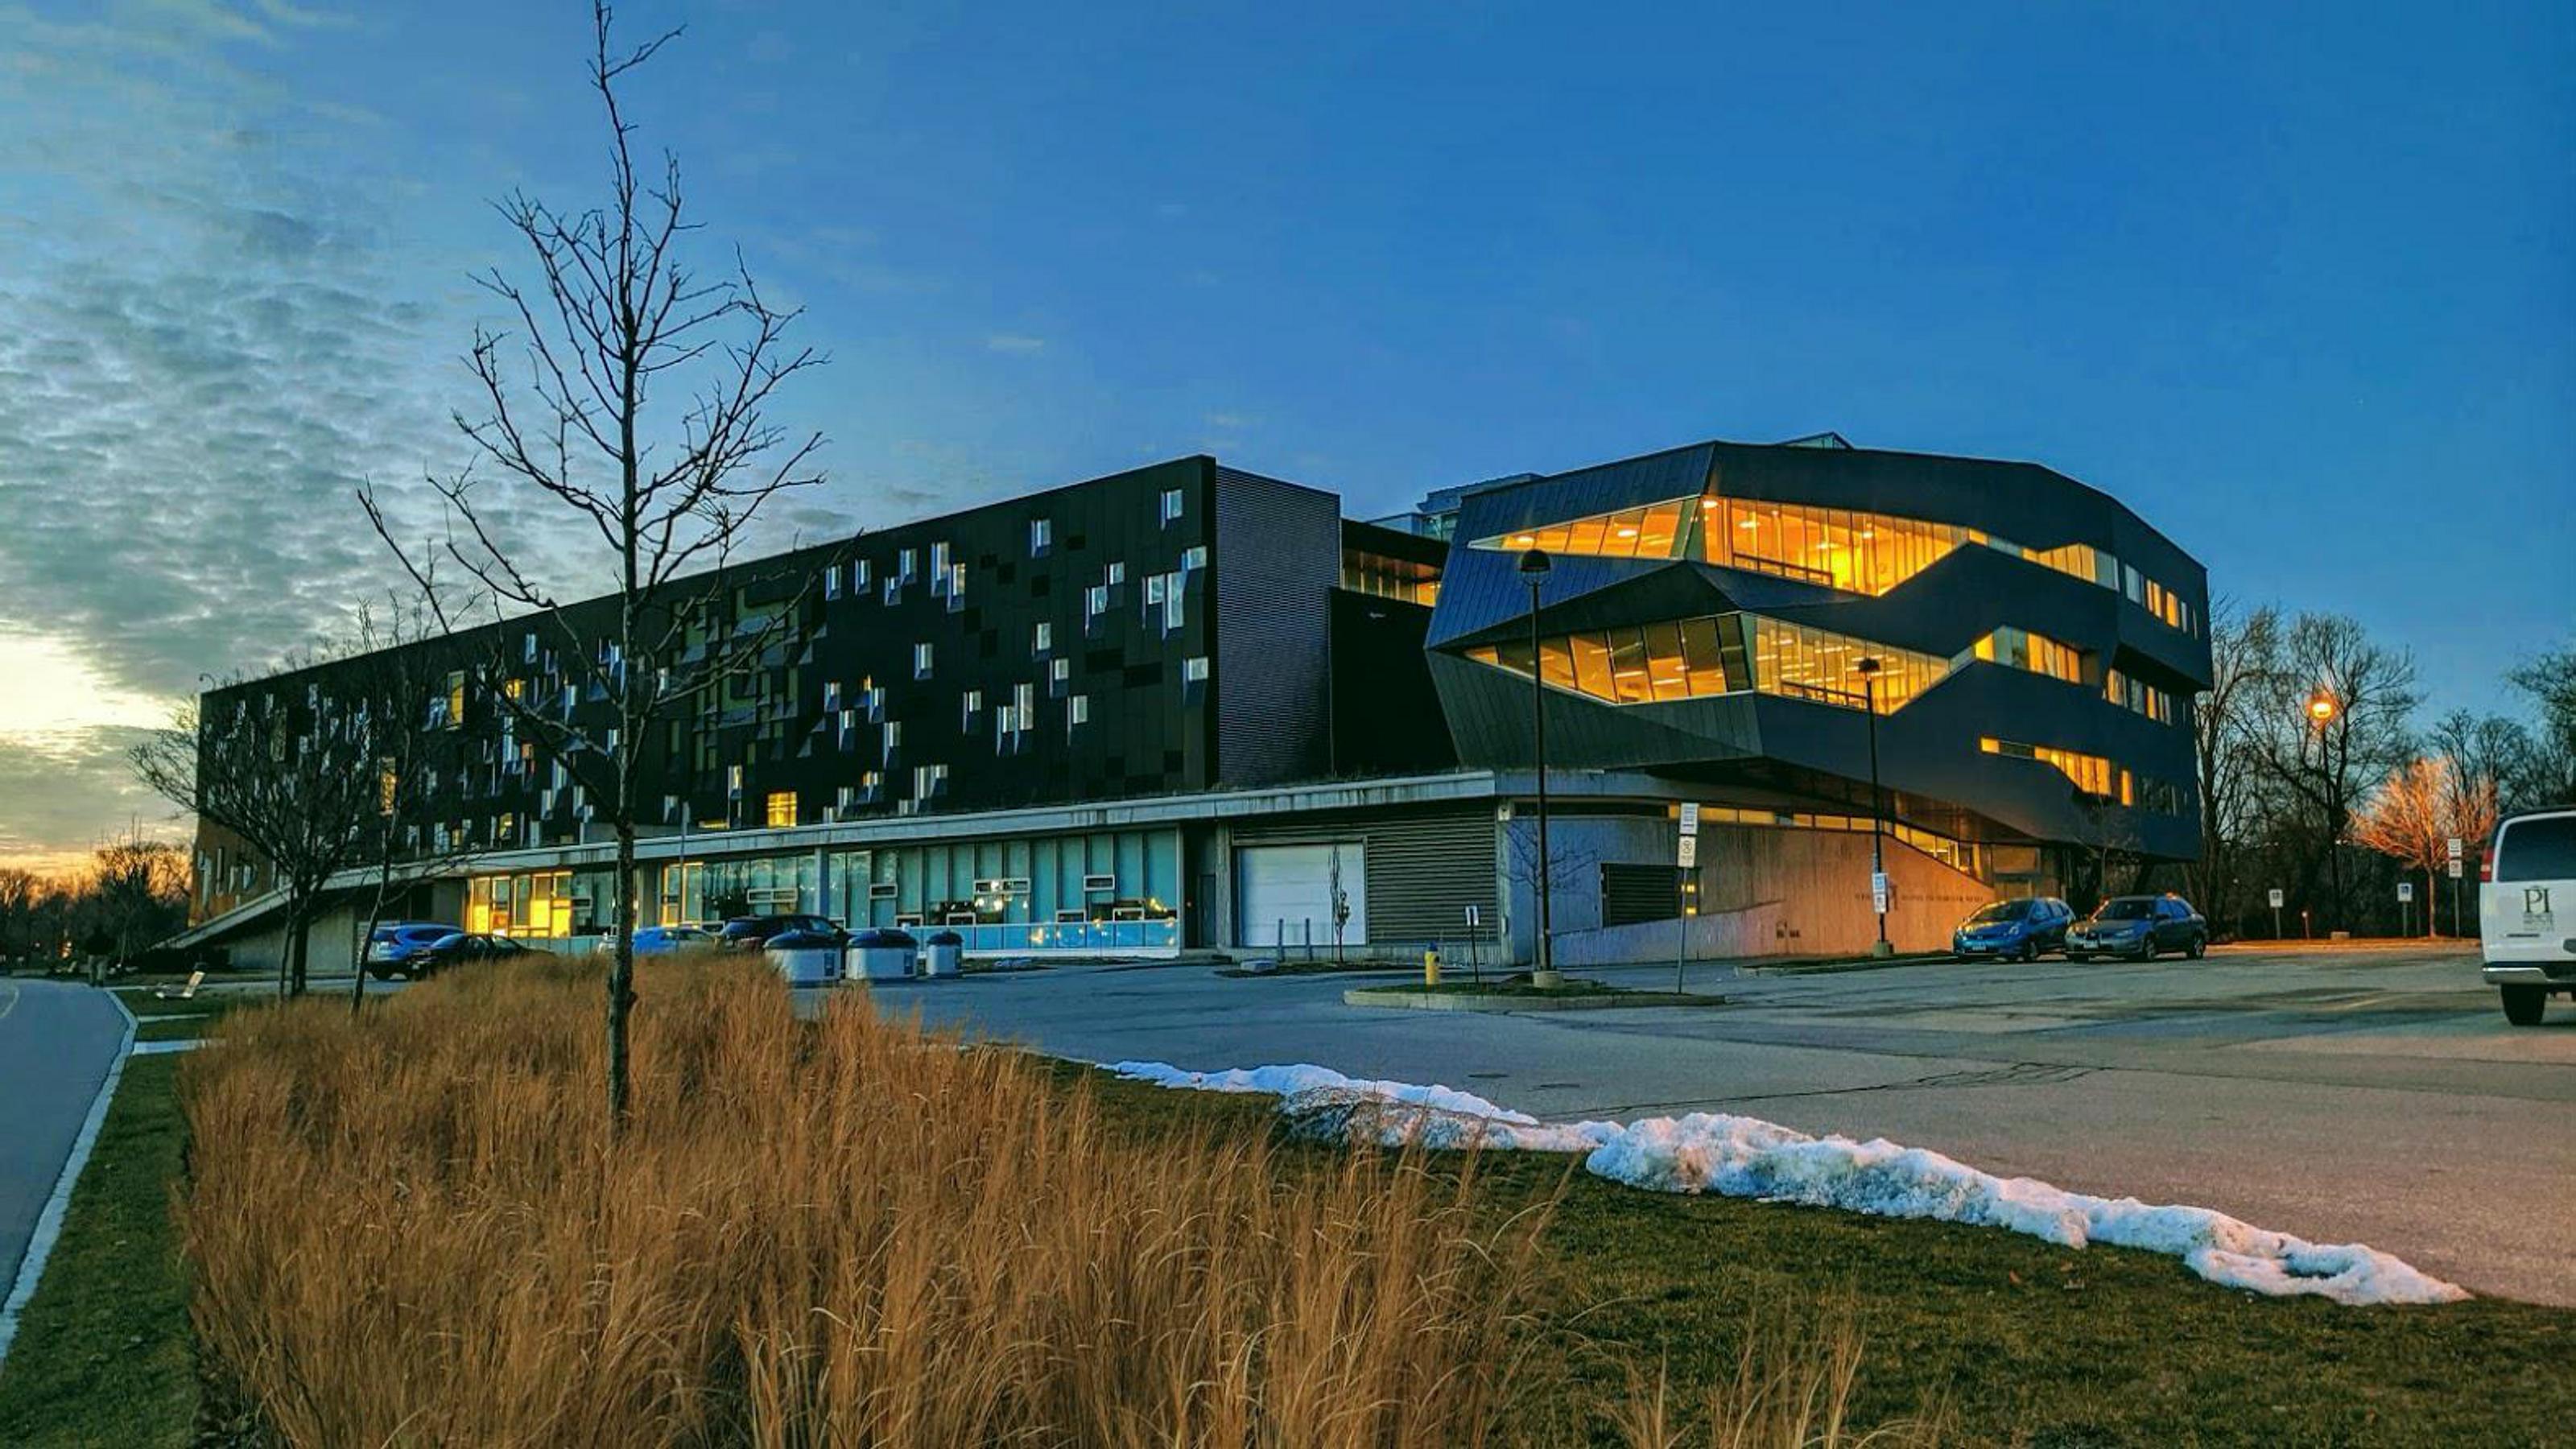 Canada's Perimeter Institute for Theoretical Physics in Waterloo, Ontario